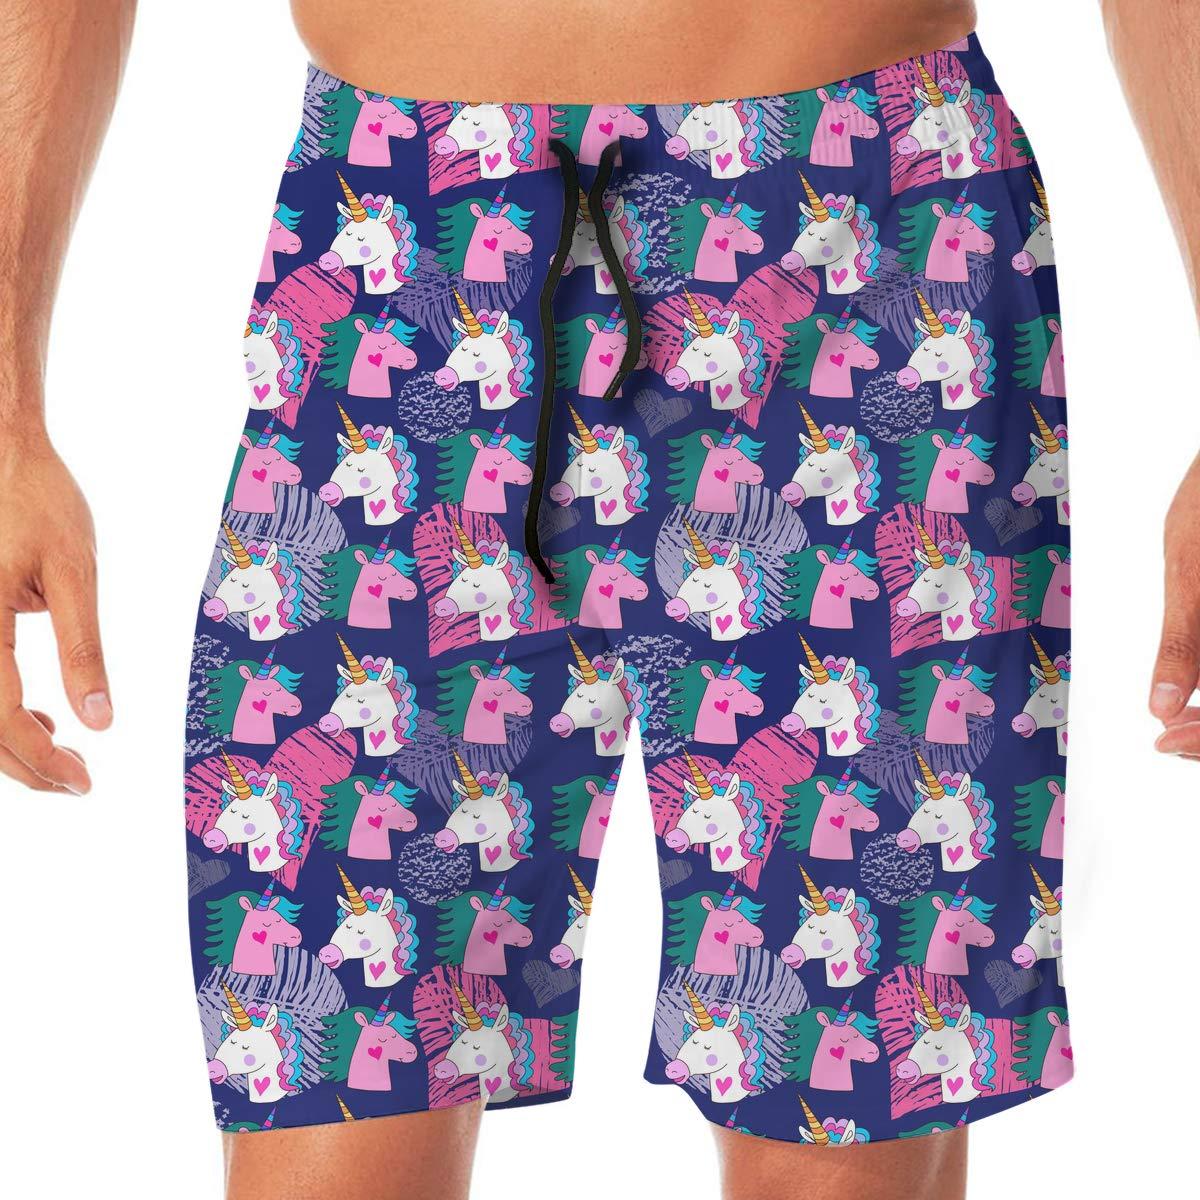 Mens Unicorn and Star Pattern Boardshorts Swimming Shorts No Mesh Lining